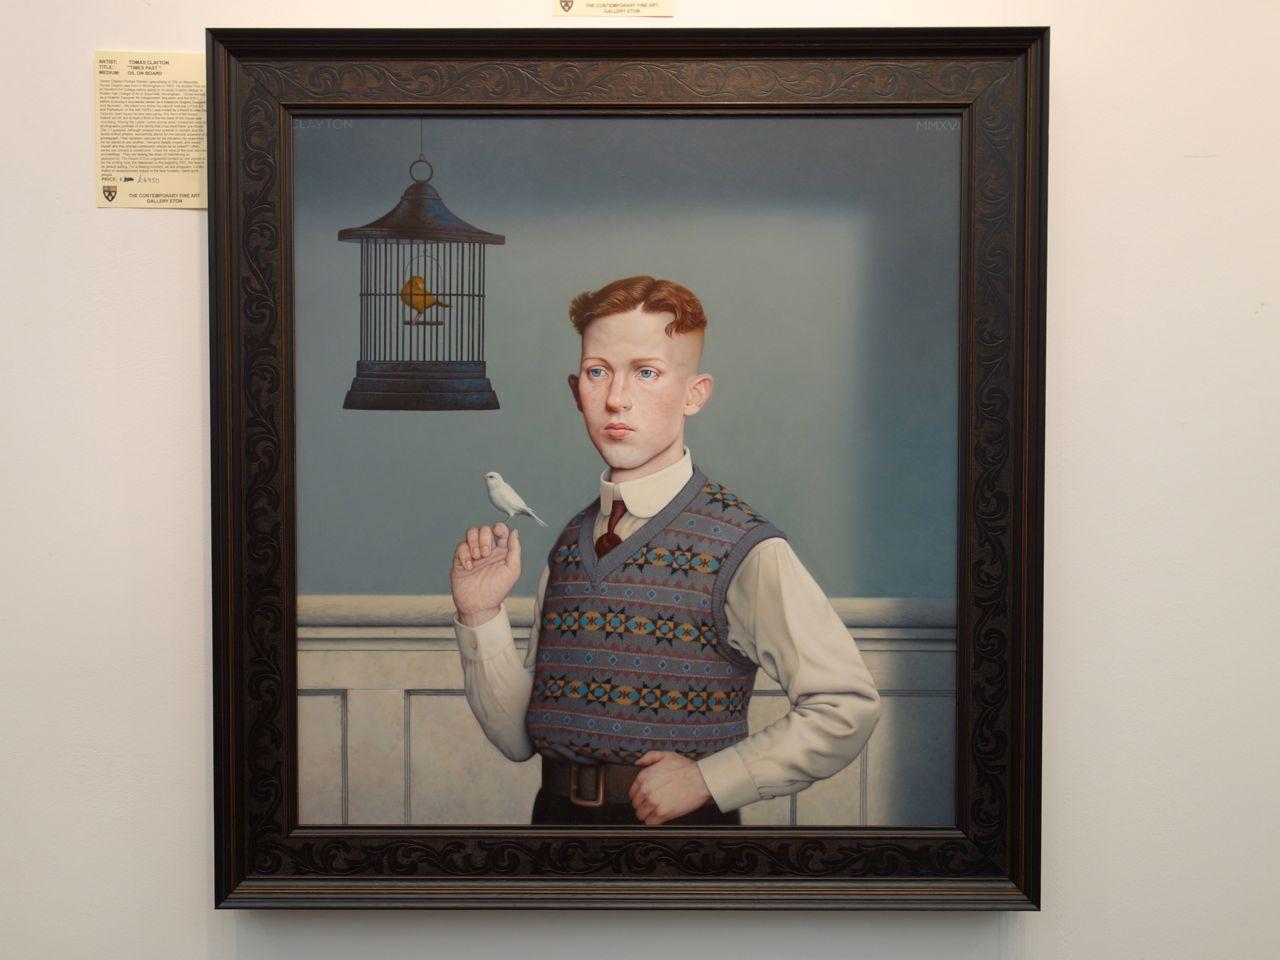 Tomas Clayton, 'French Windows', Oil on board, 60 x 60 cm. The Contemporary Fine Art Gallery Eton (Eton)